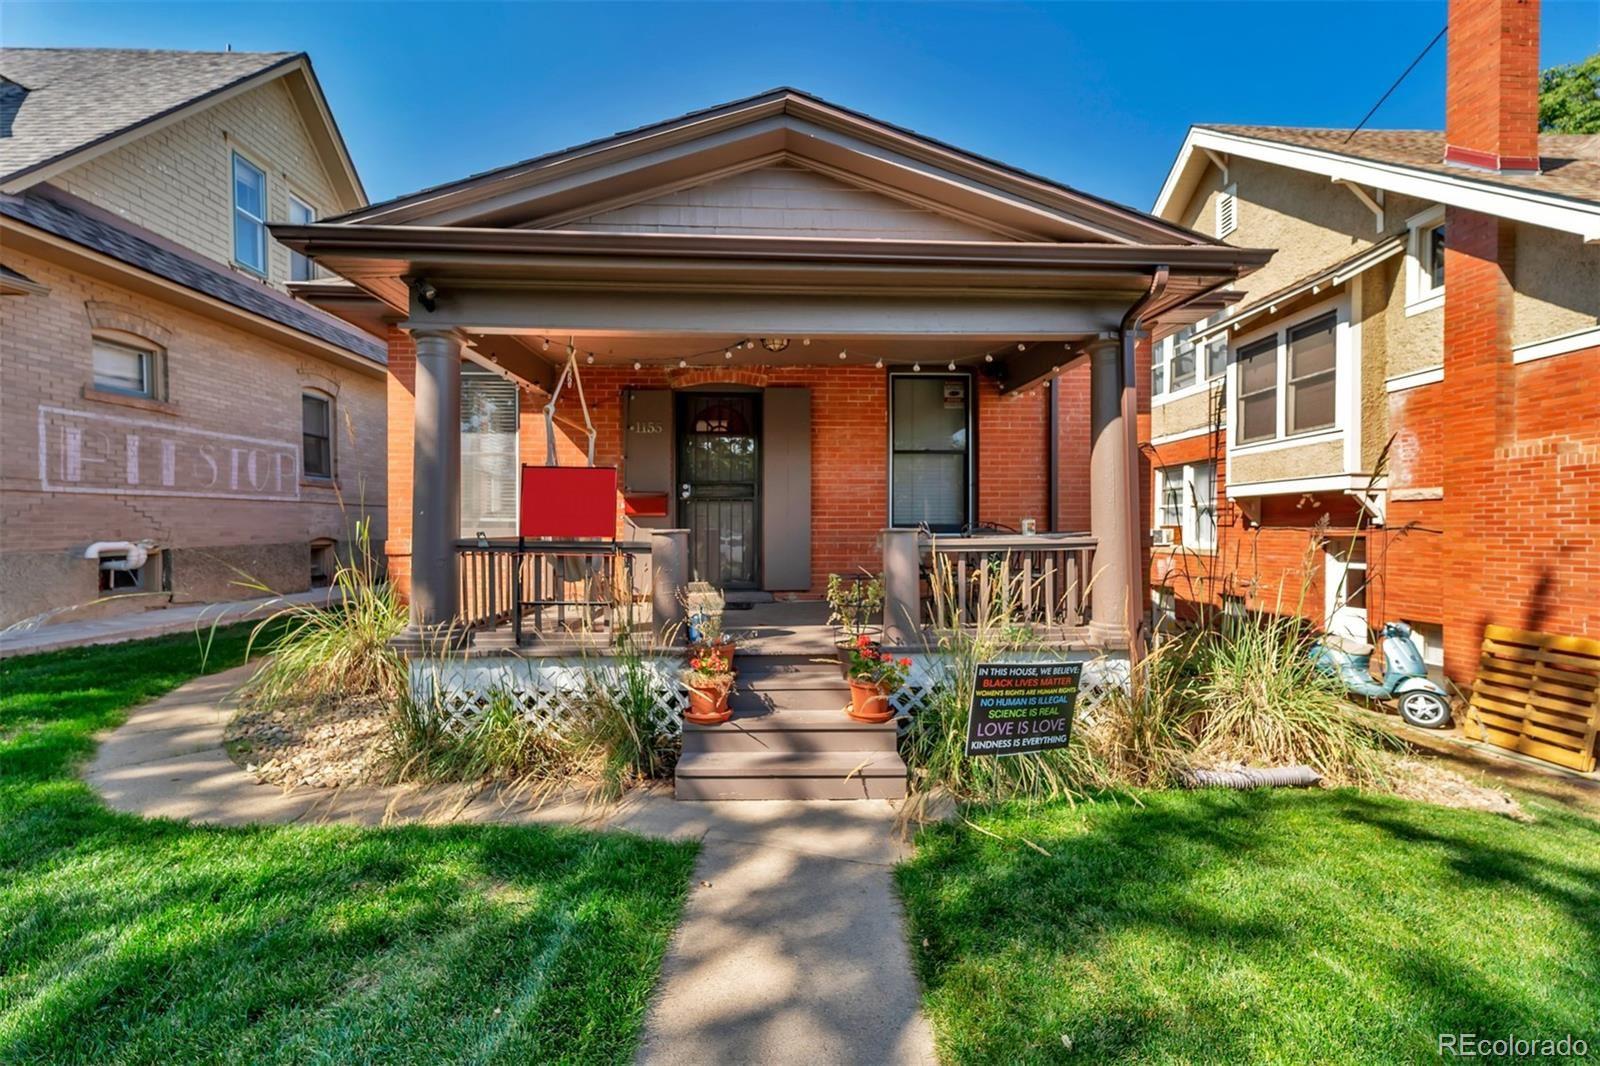 1155 Tenth Street, Boulder, CO 80302 - #: 7614826